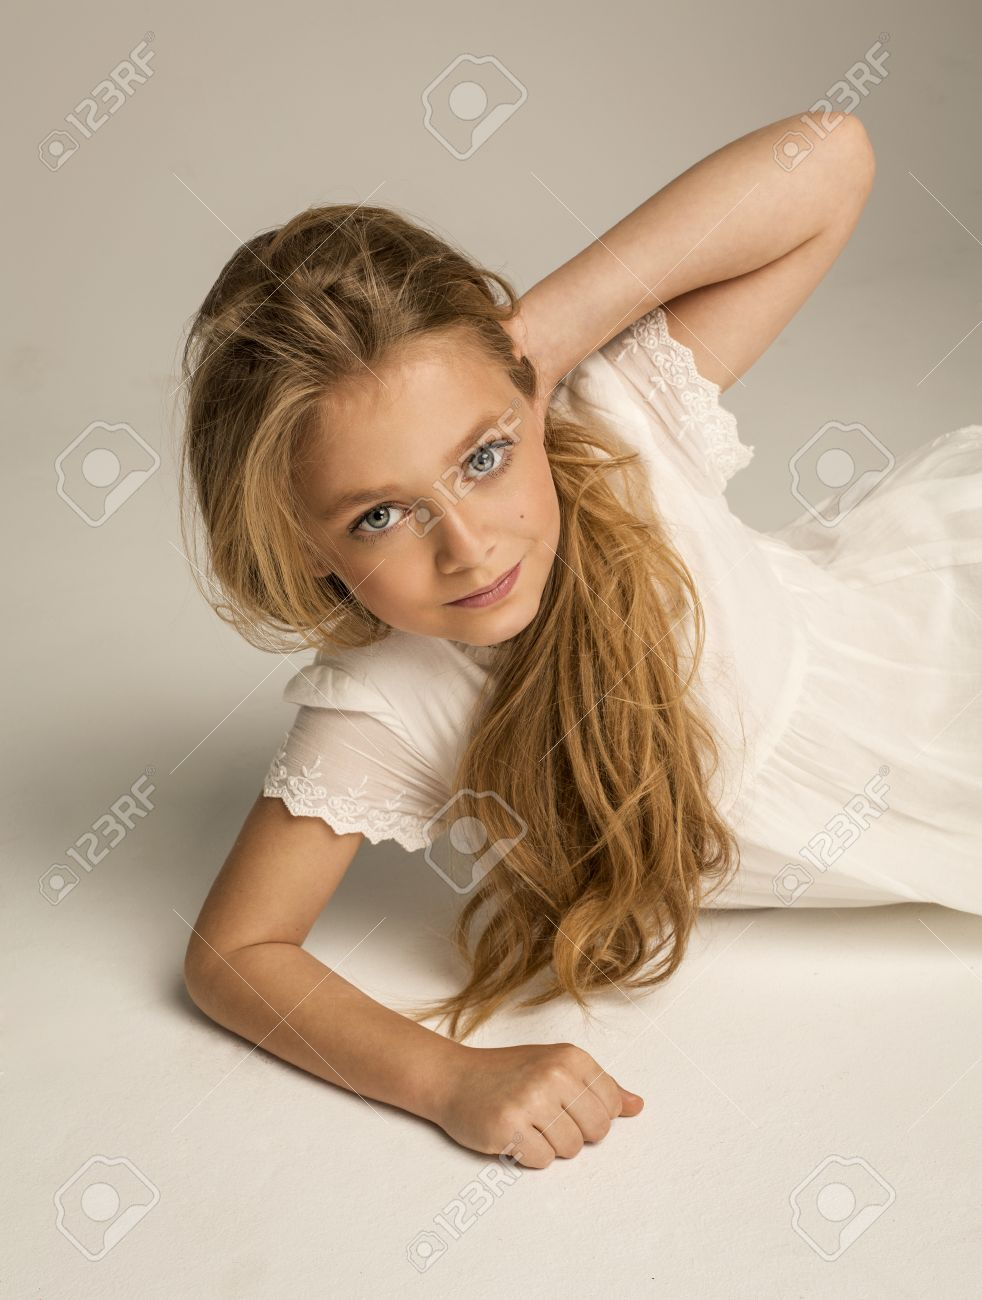 Girl model pre teen young